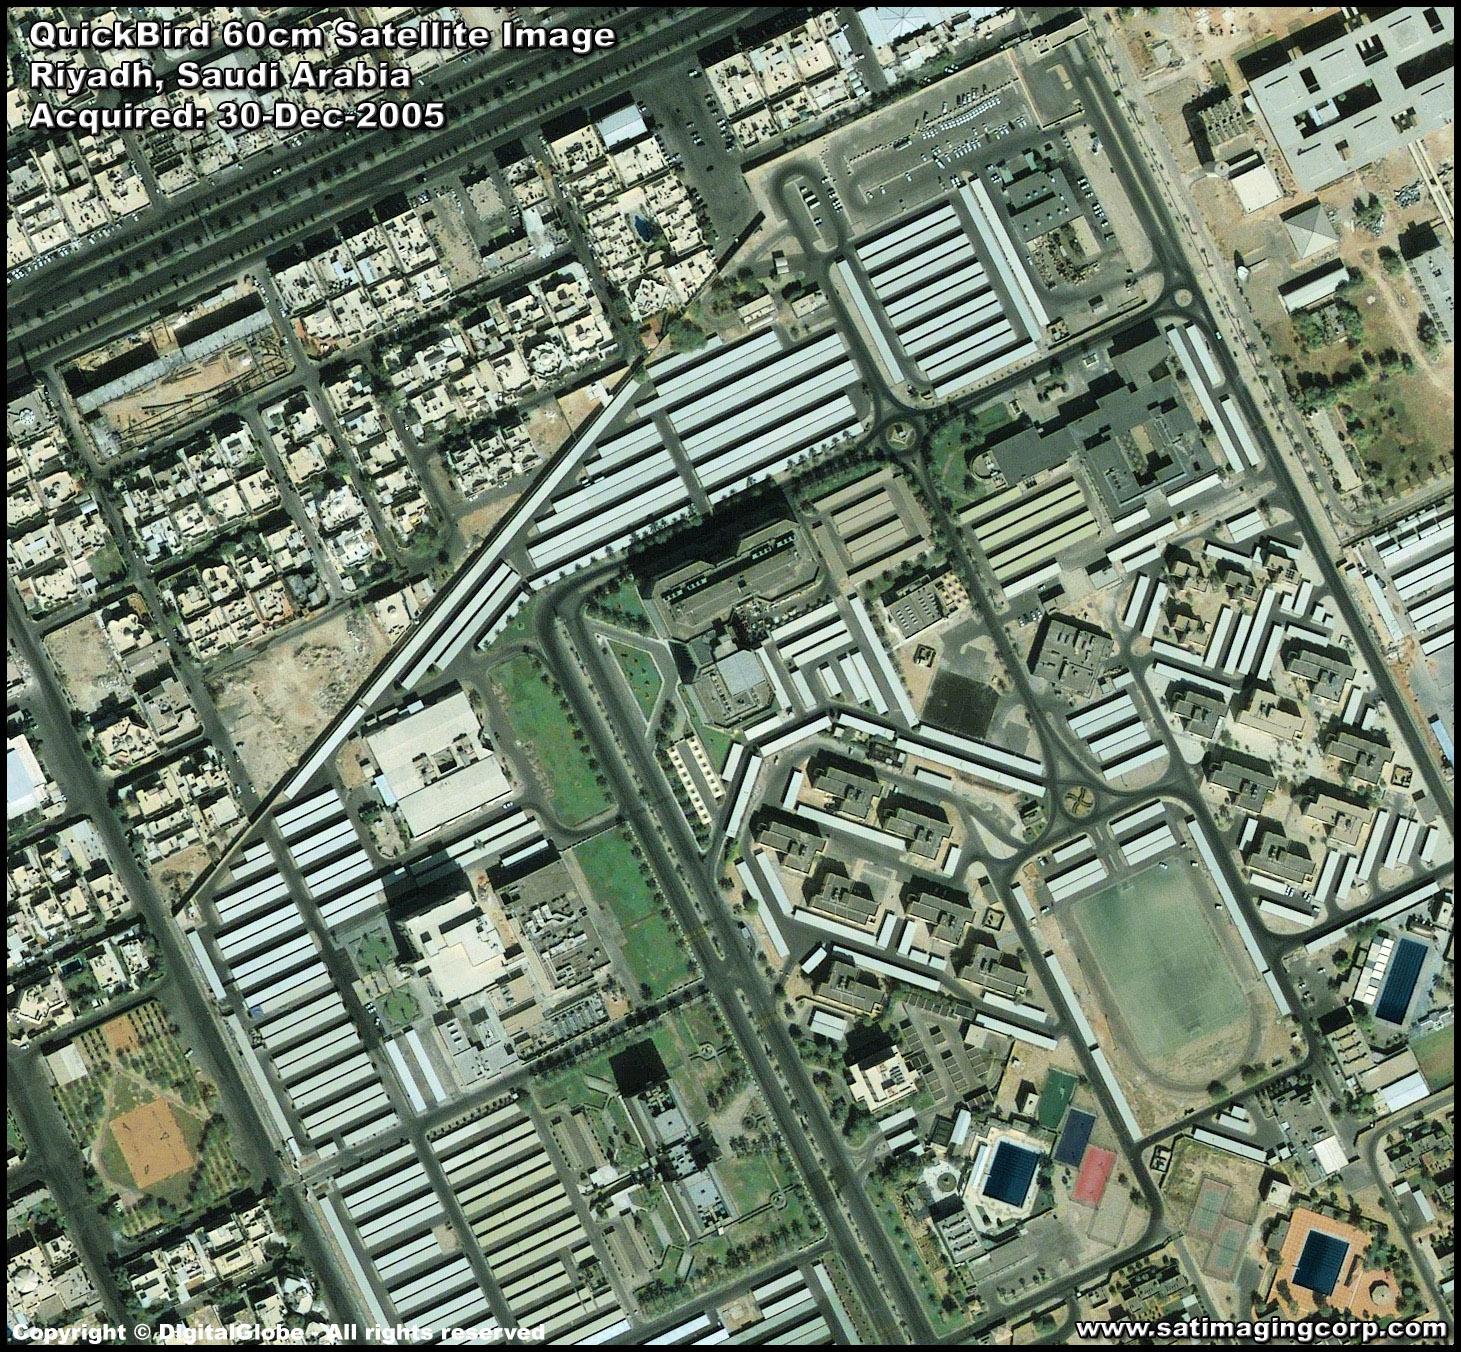 QuickBird Satellite Image of Riyadh, Saudi Arabia